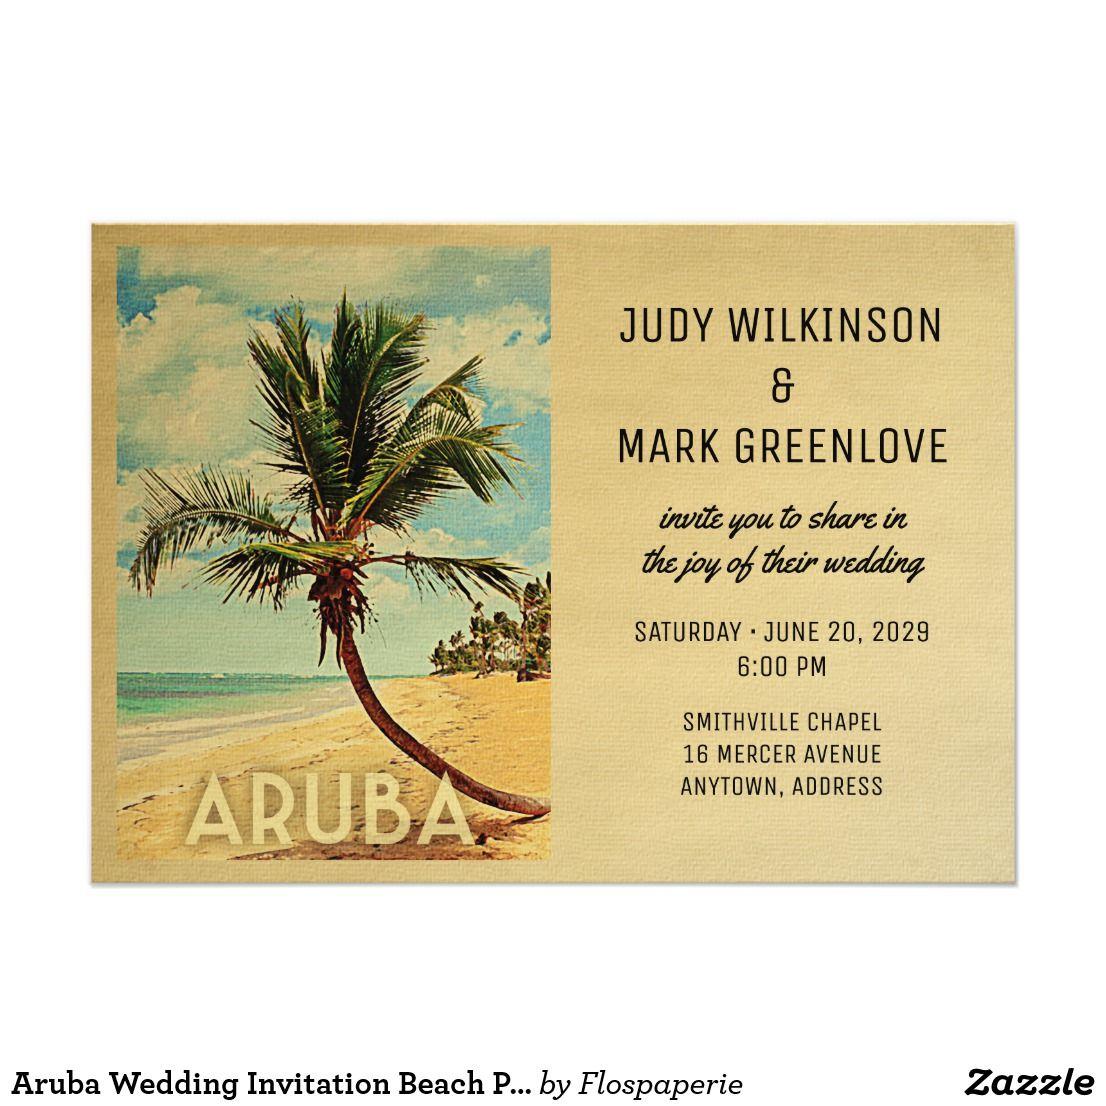 Aruba Wedding Invitation Beach Palm Tree | Beach Wedding Invitations ...